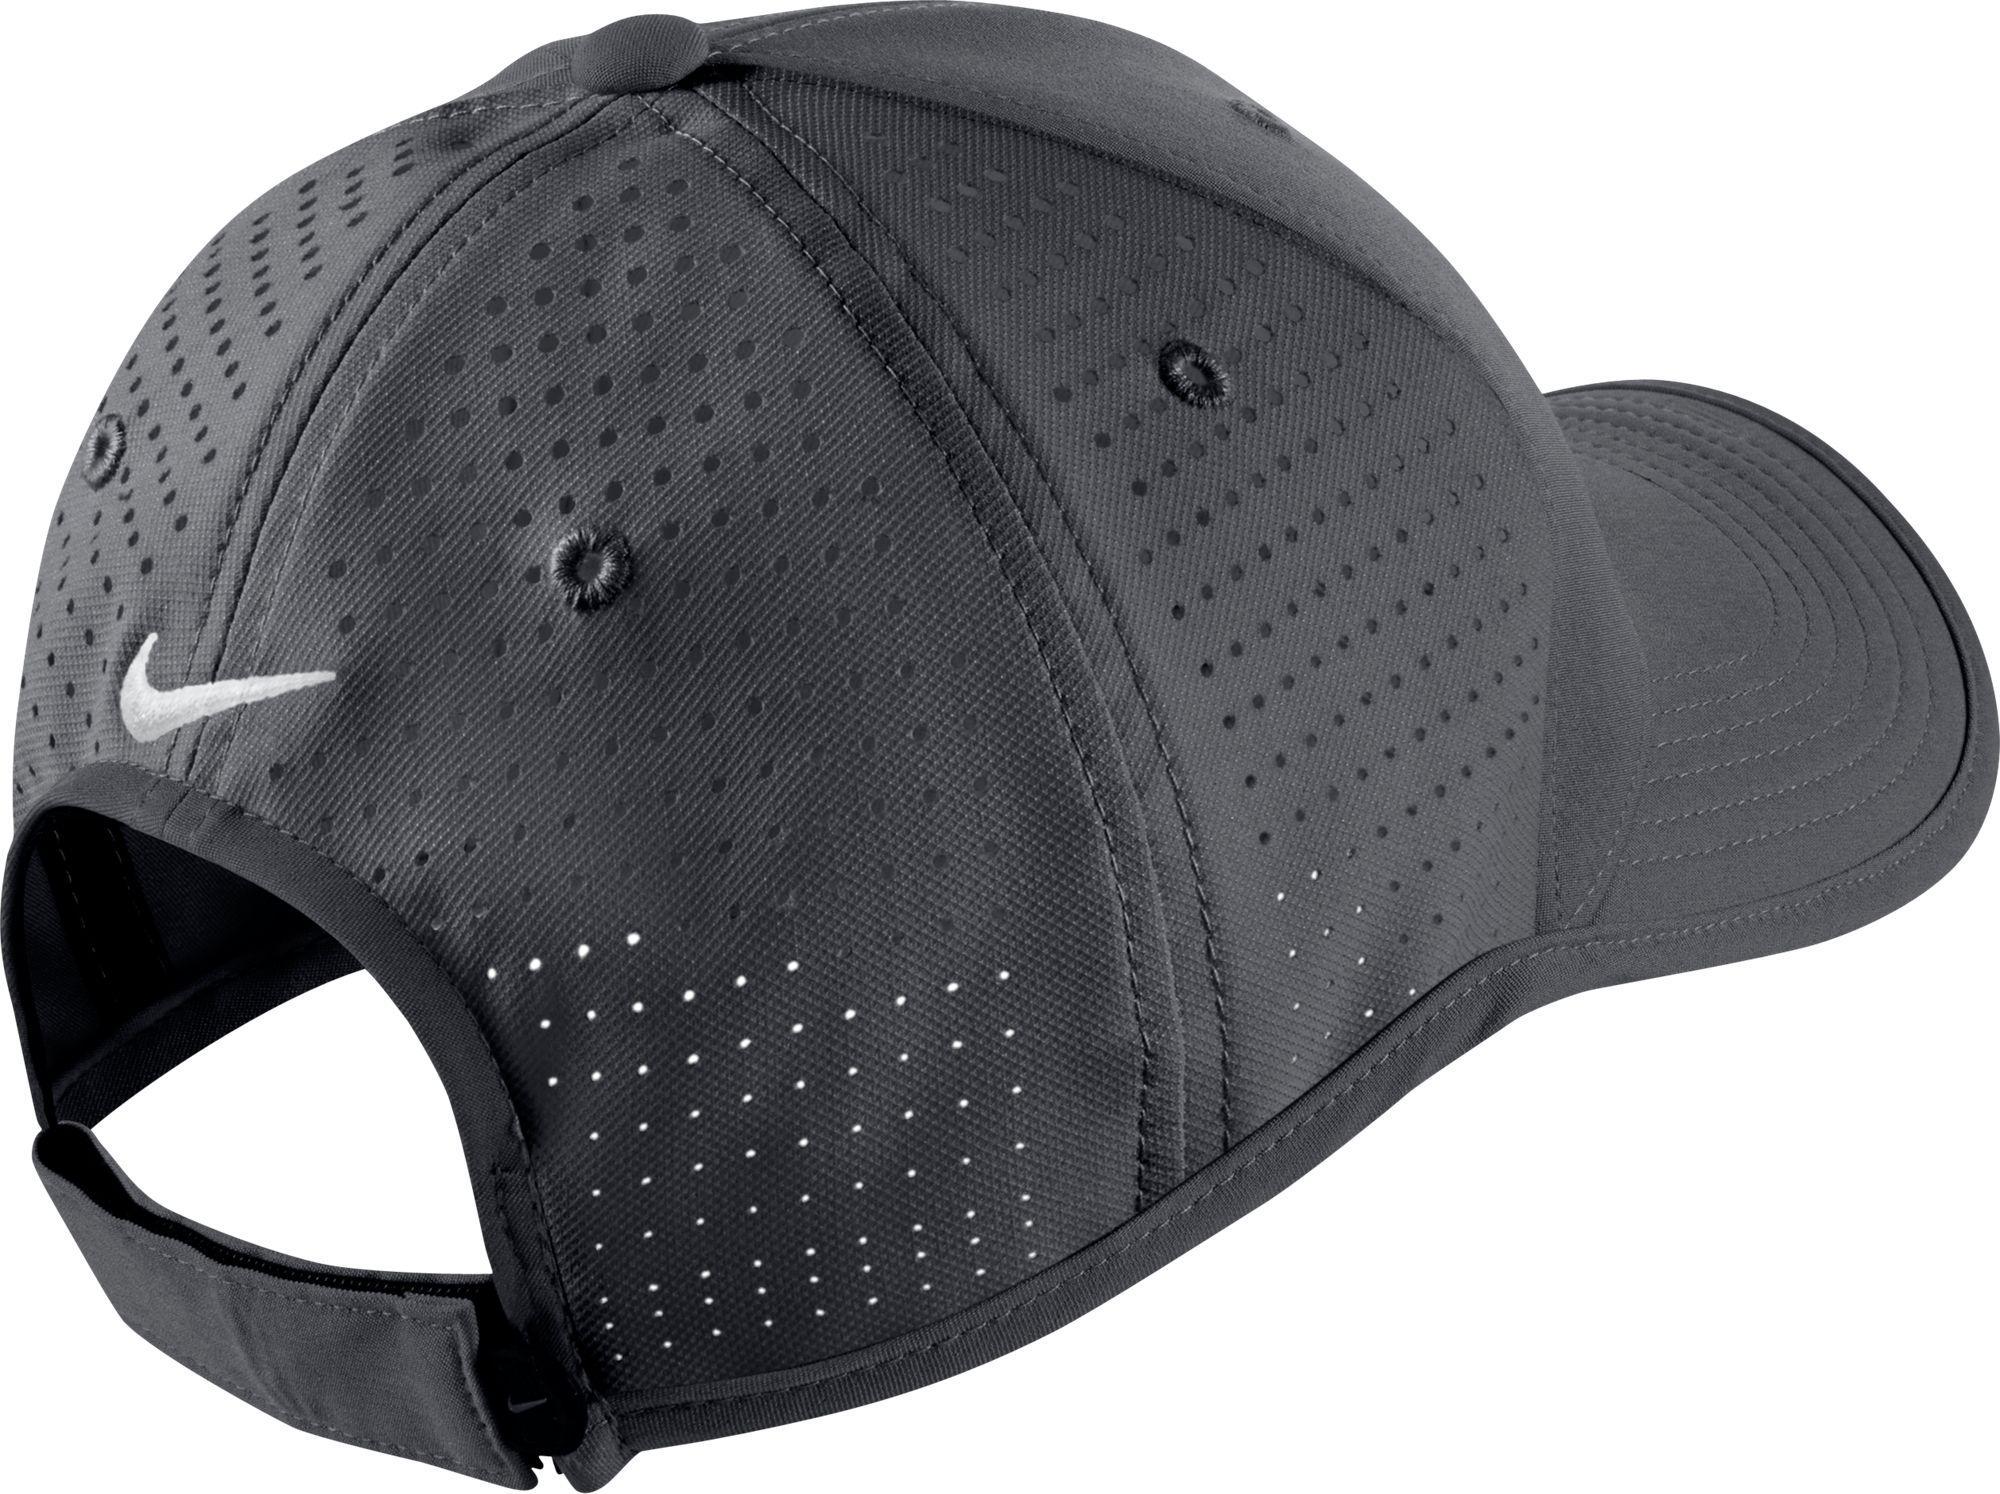 1b3cf1688d4 Lyst - Nike Tiger Woods Ultralight Tour Golf Hat in Gray for Men